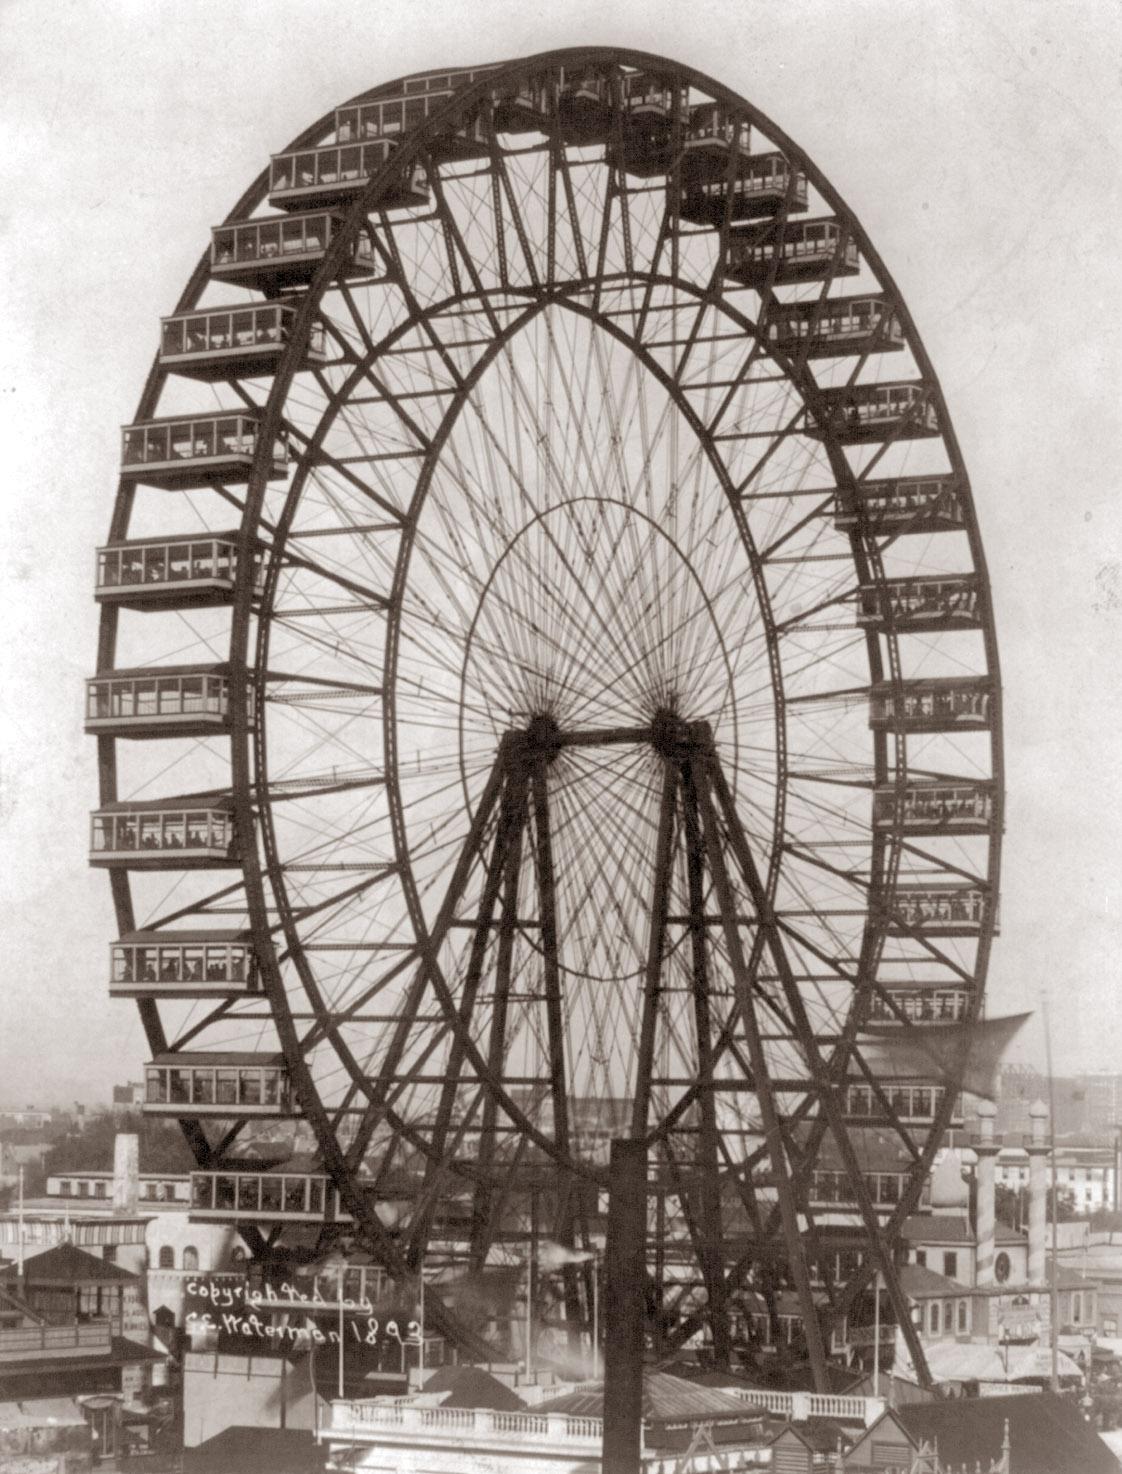 Chicago Wheel